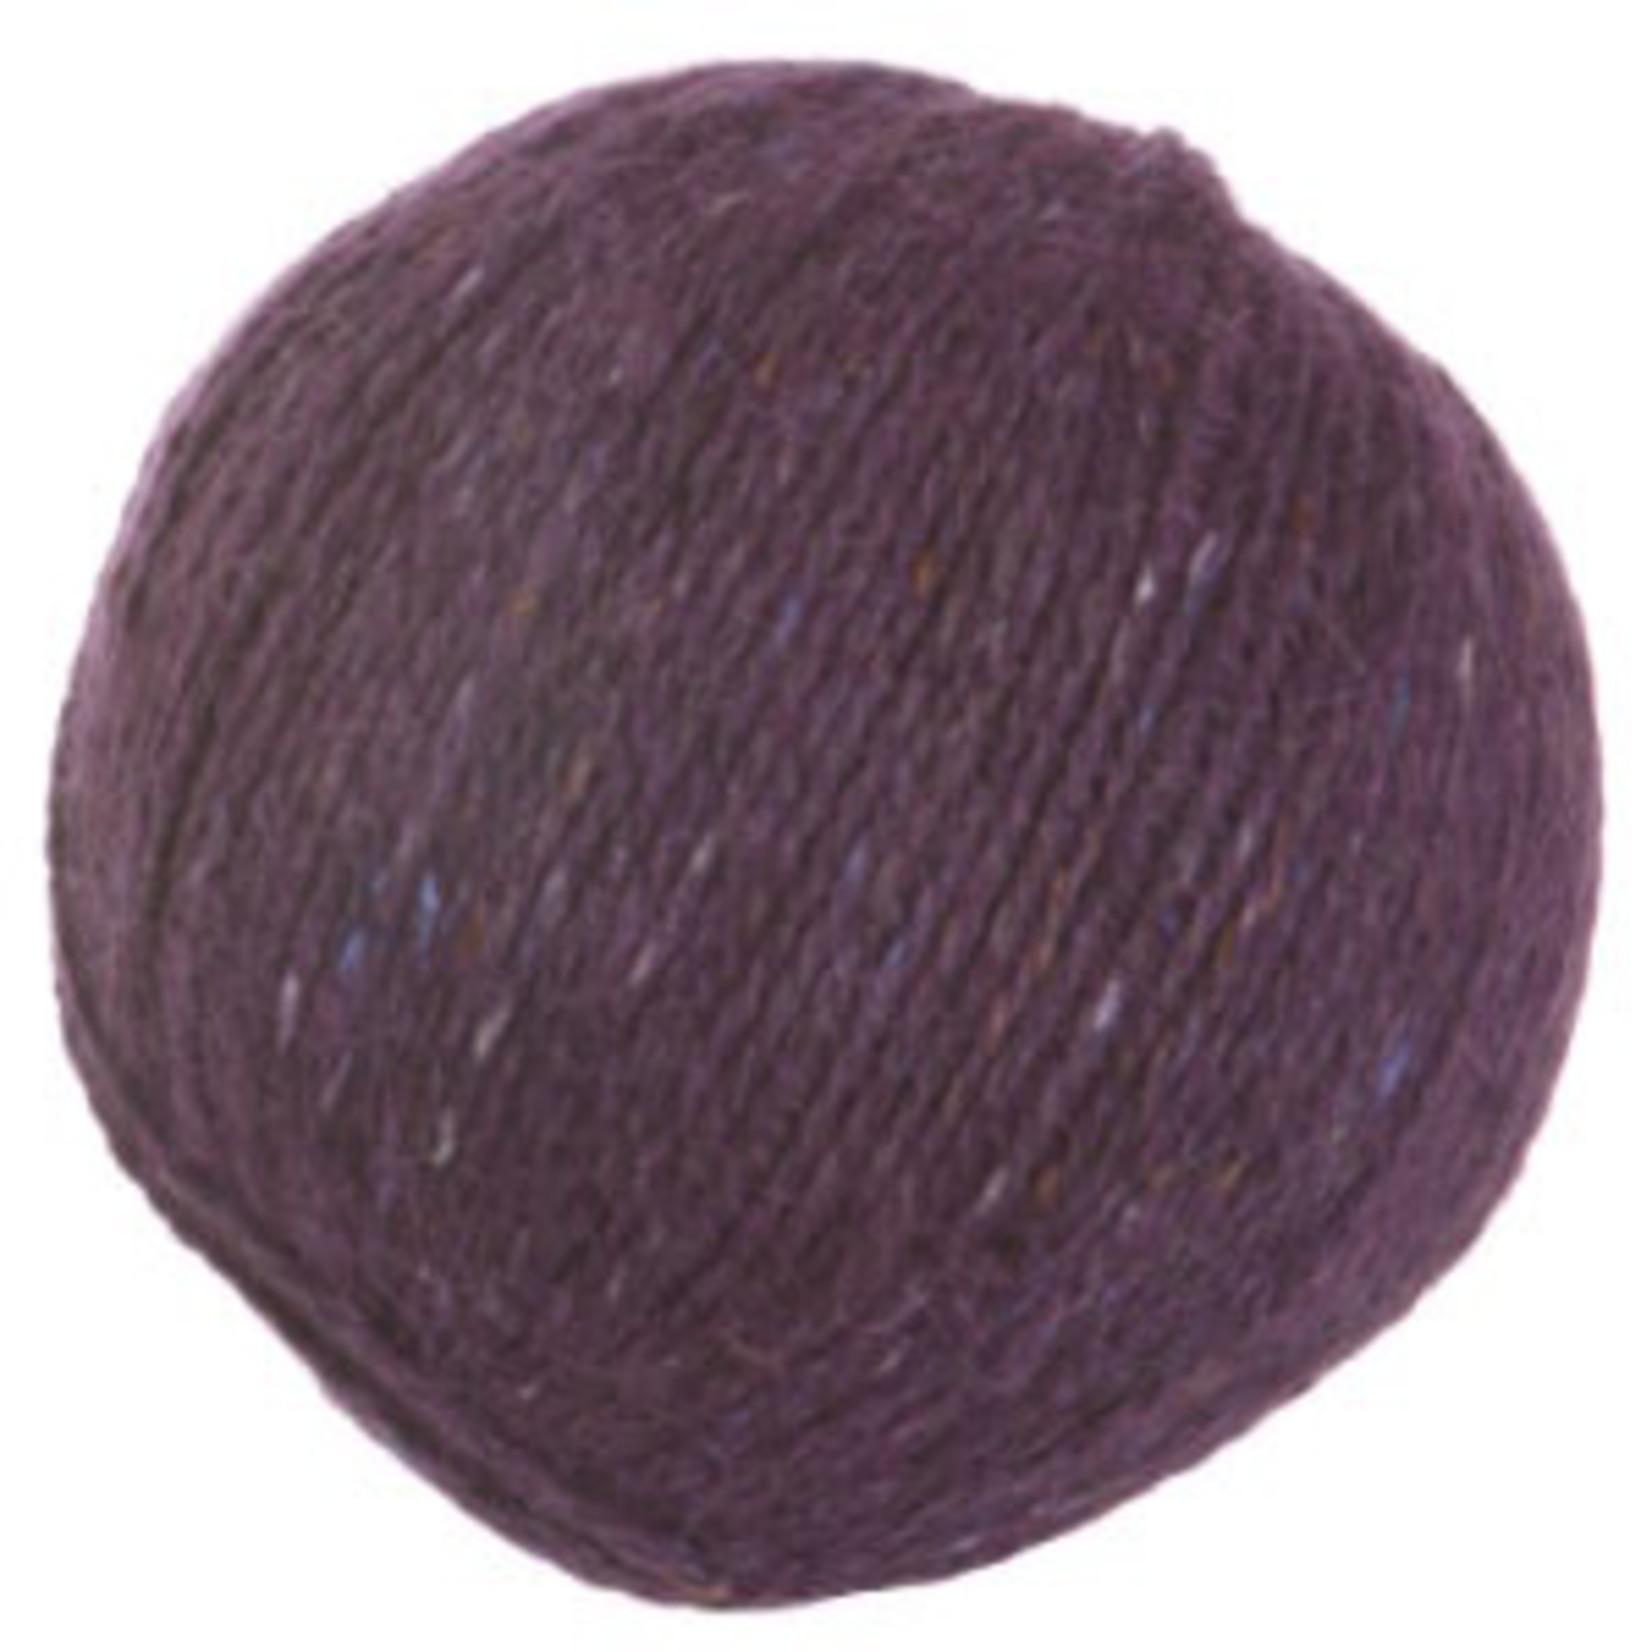 Sirdar Spinning Felted Tweed, 151, Bilberry